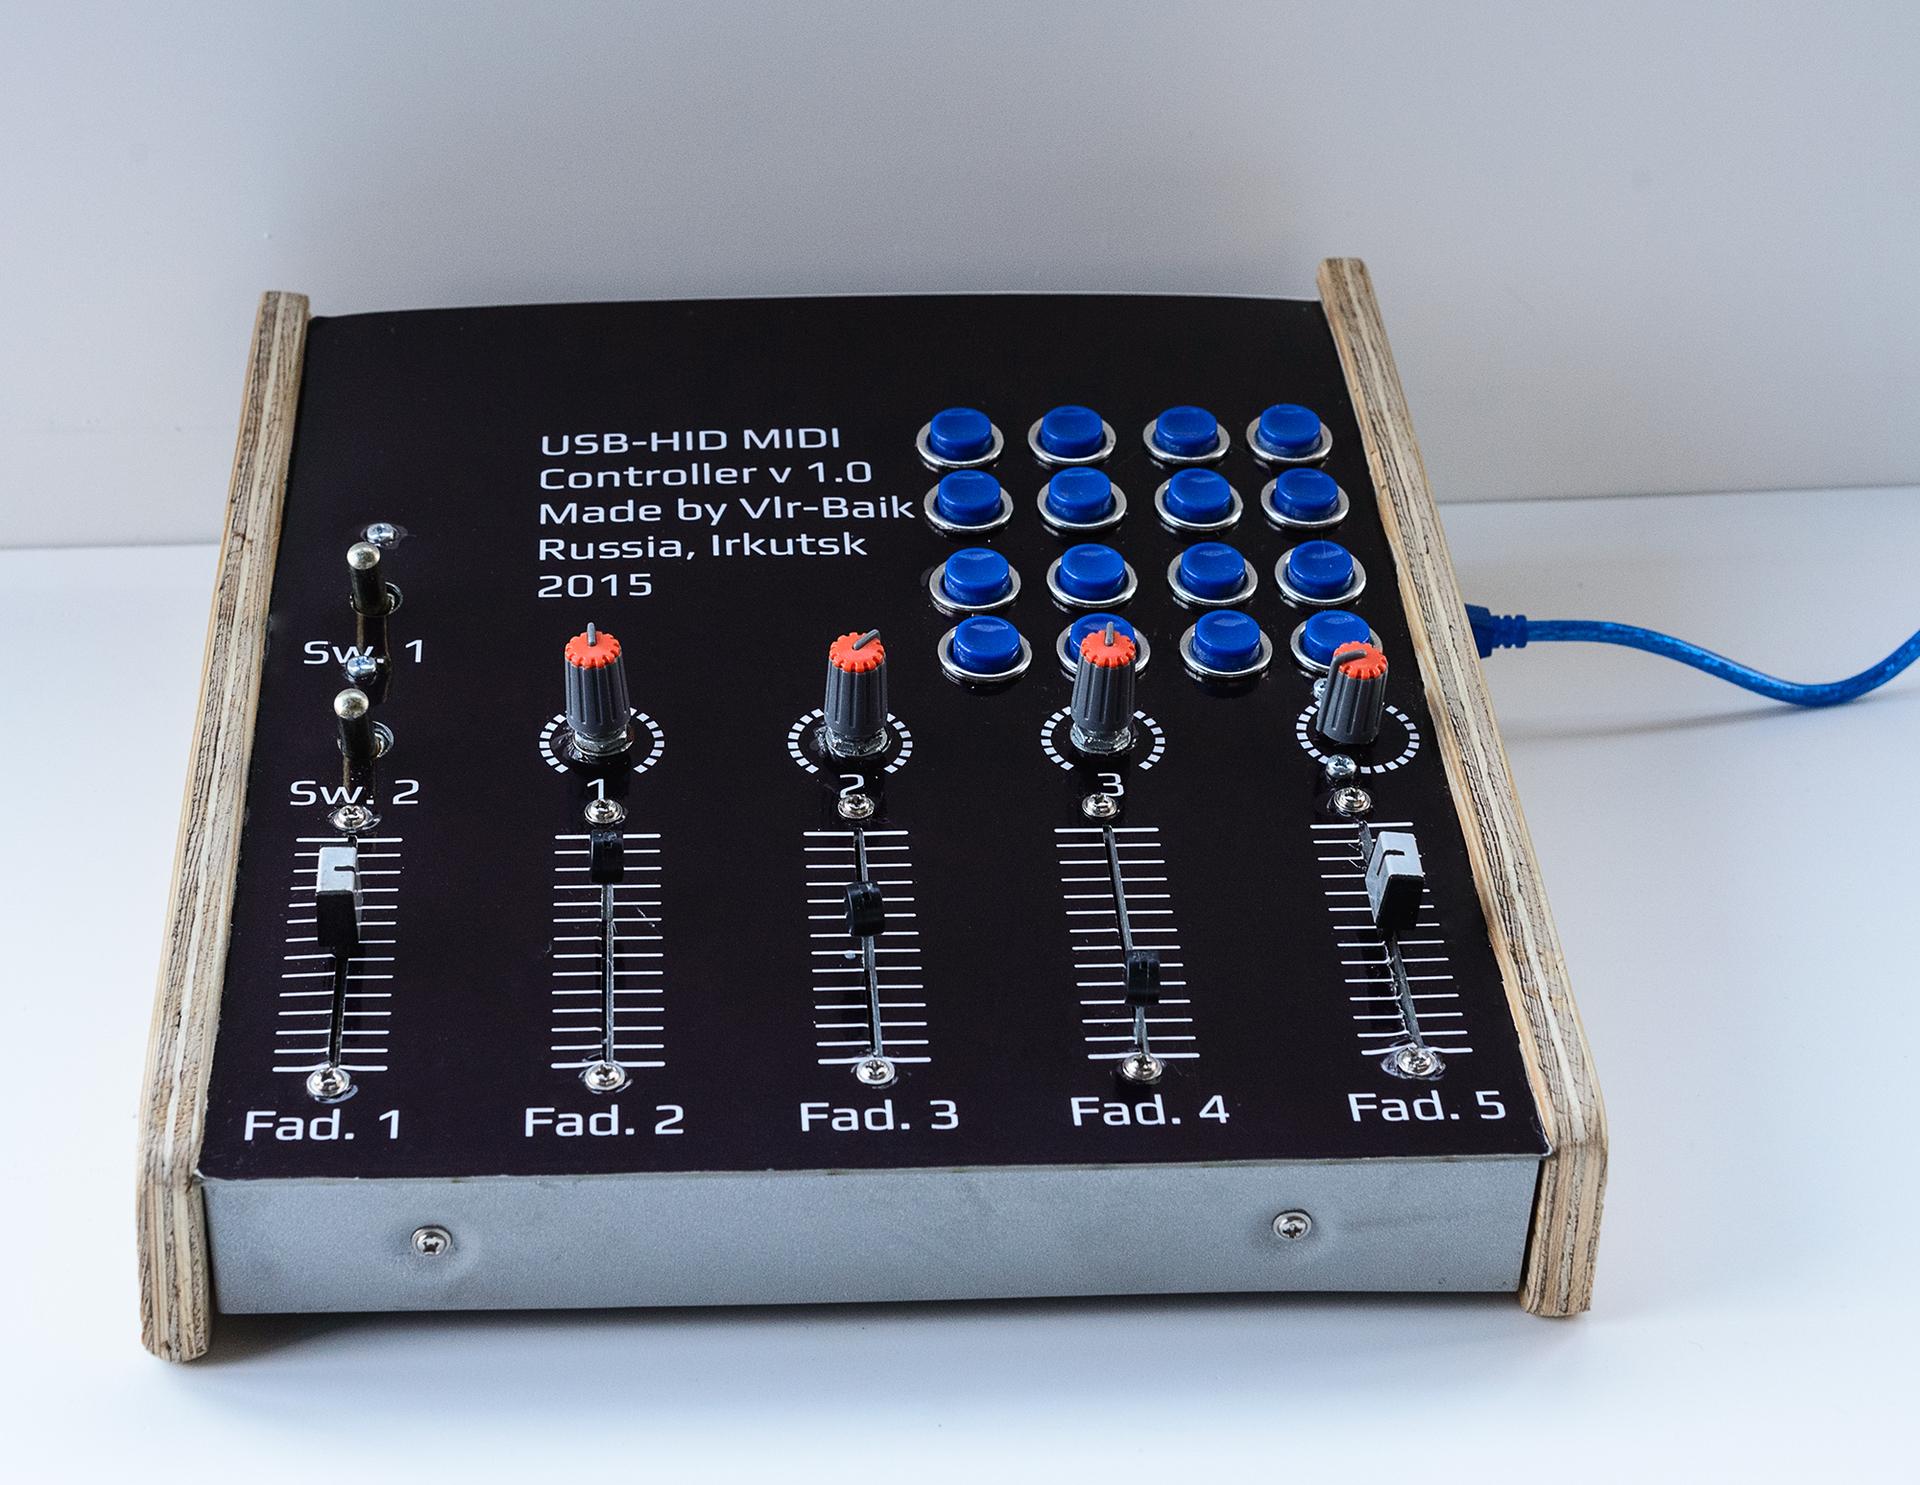 MIDI -контроллеры и примочки 81